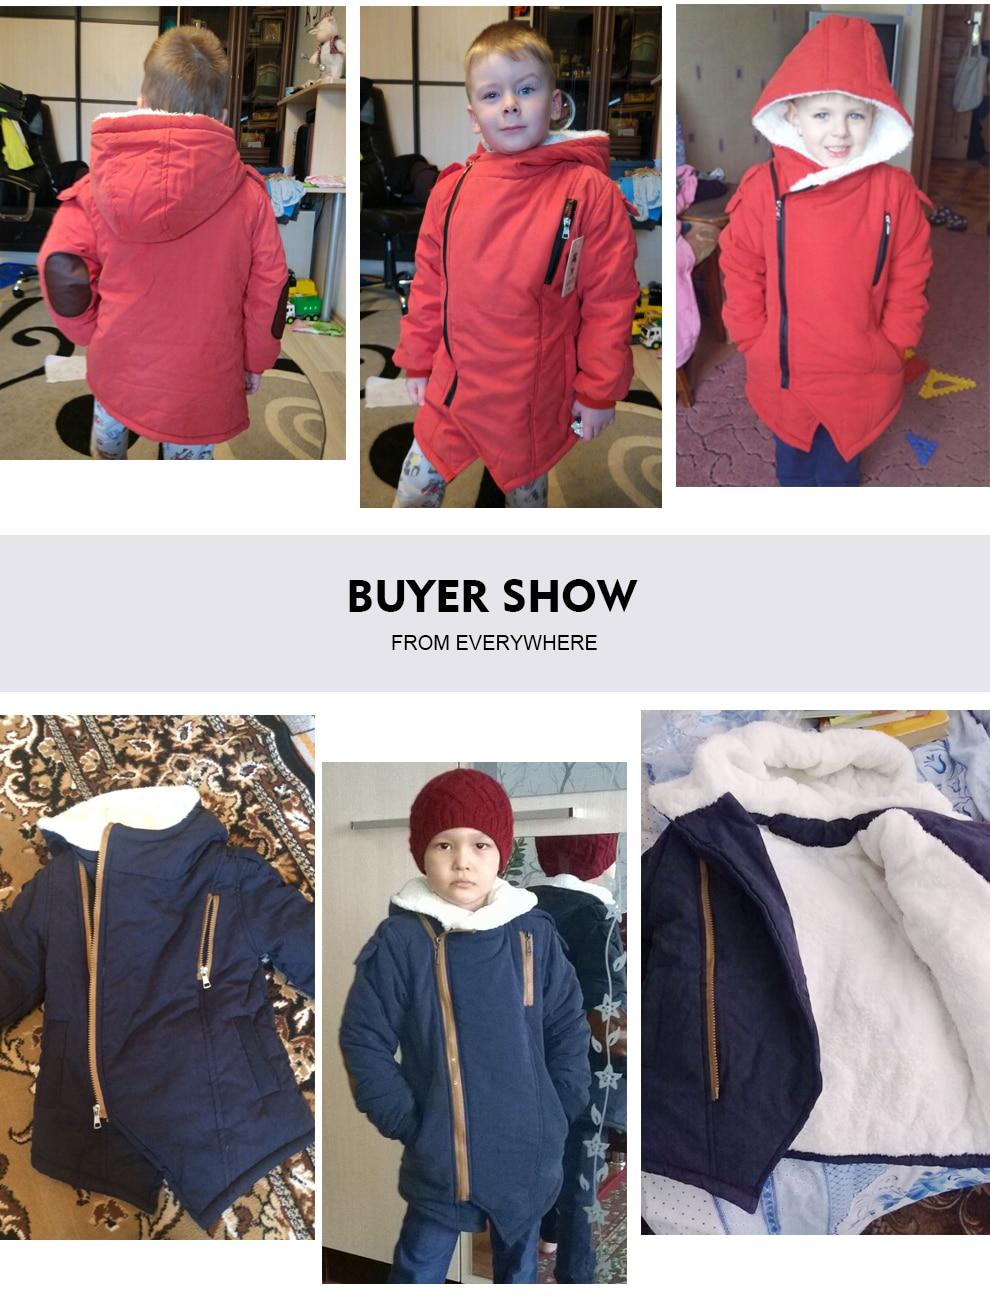 New-Brand-2017-Autumn-Winter-Kids-Fashion-Casual-Jackets-Boys-Cashmere-Long-Sleeve-Hooded-Coats-Kids-Warm-Clothing-Outwears-5